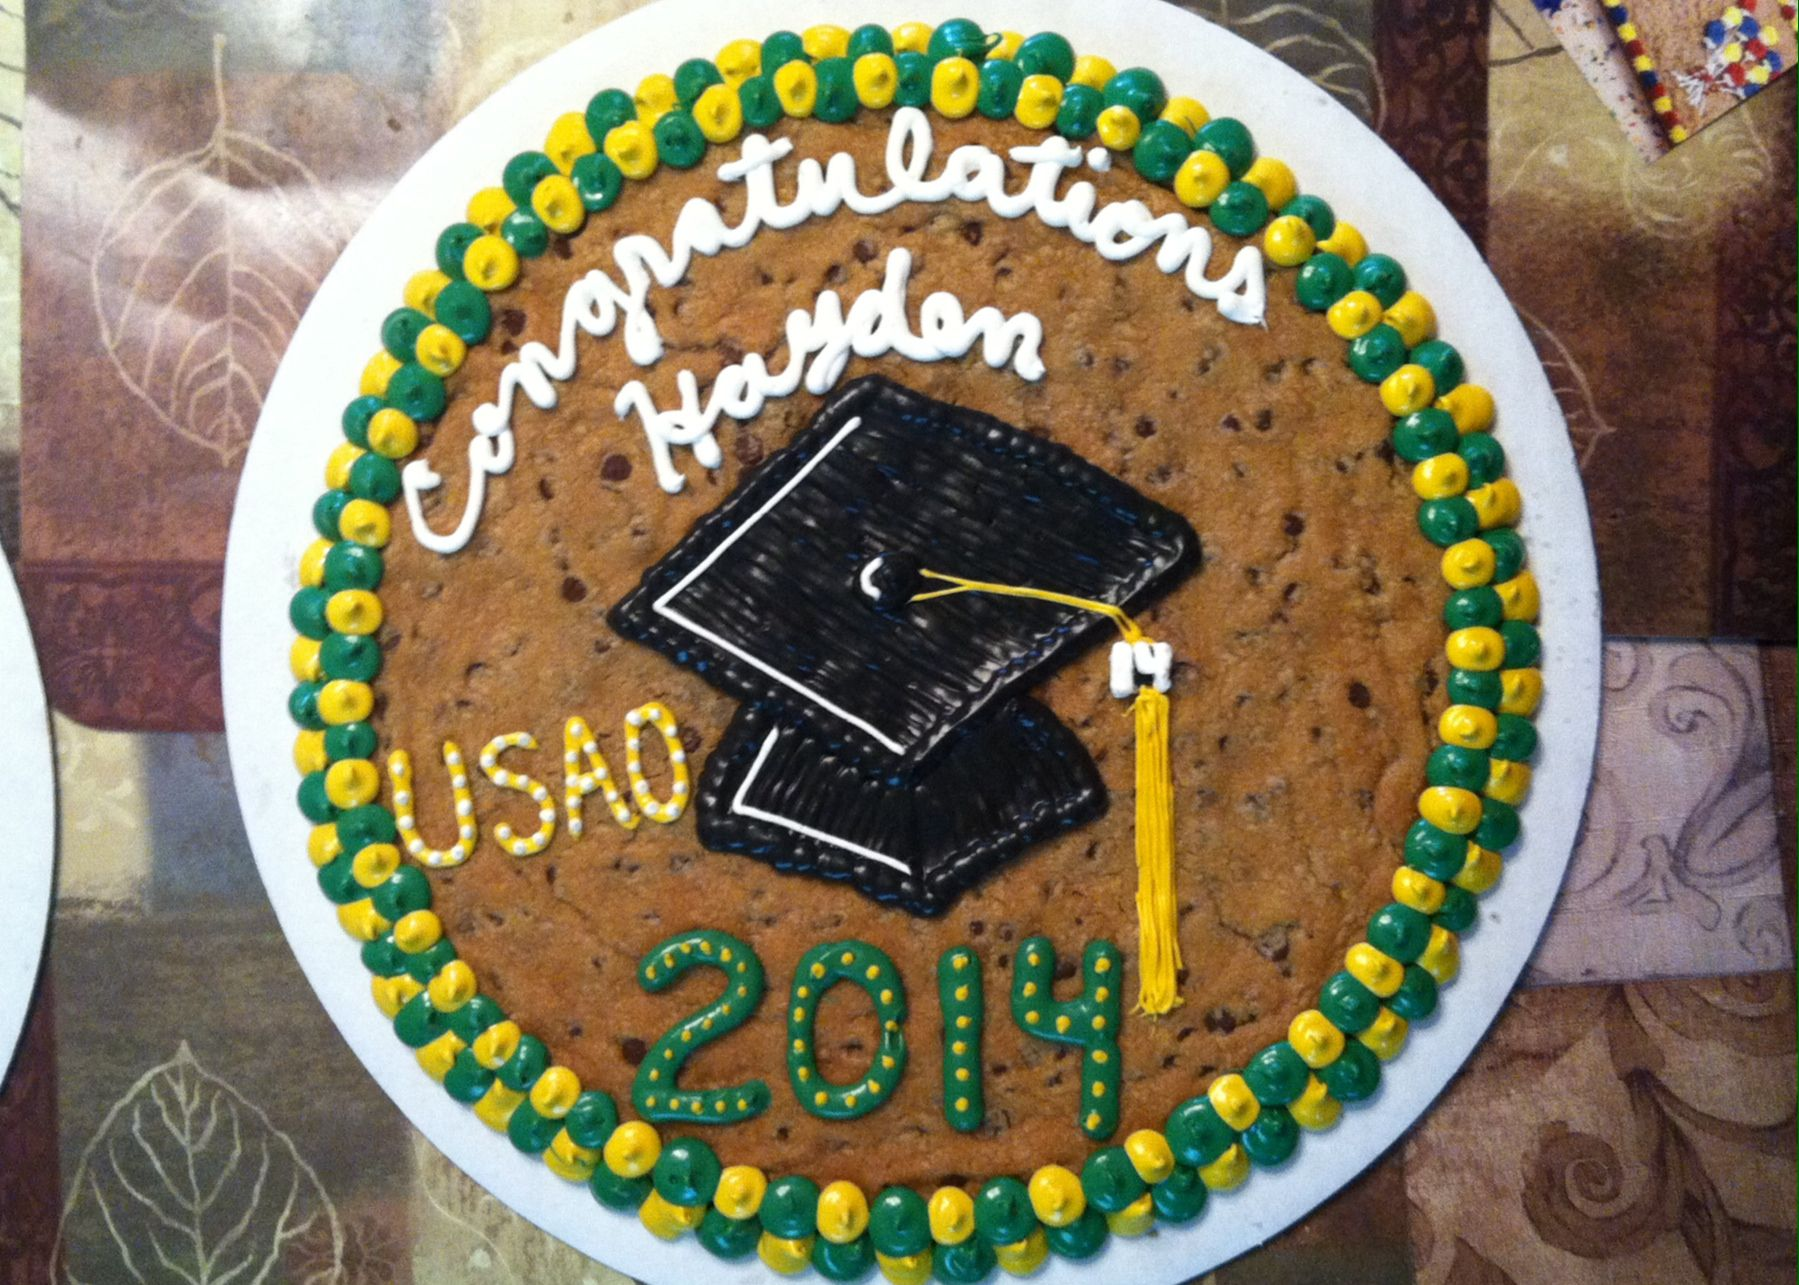 College graduation cookie cake for my nephew graduation